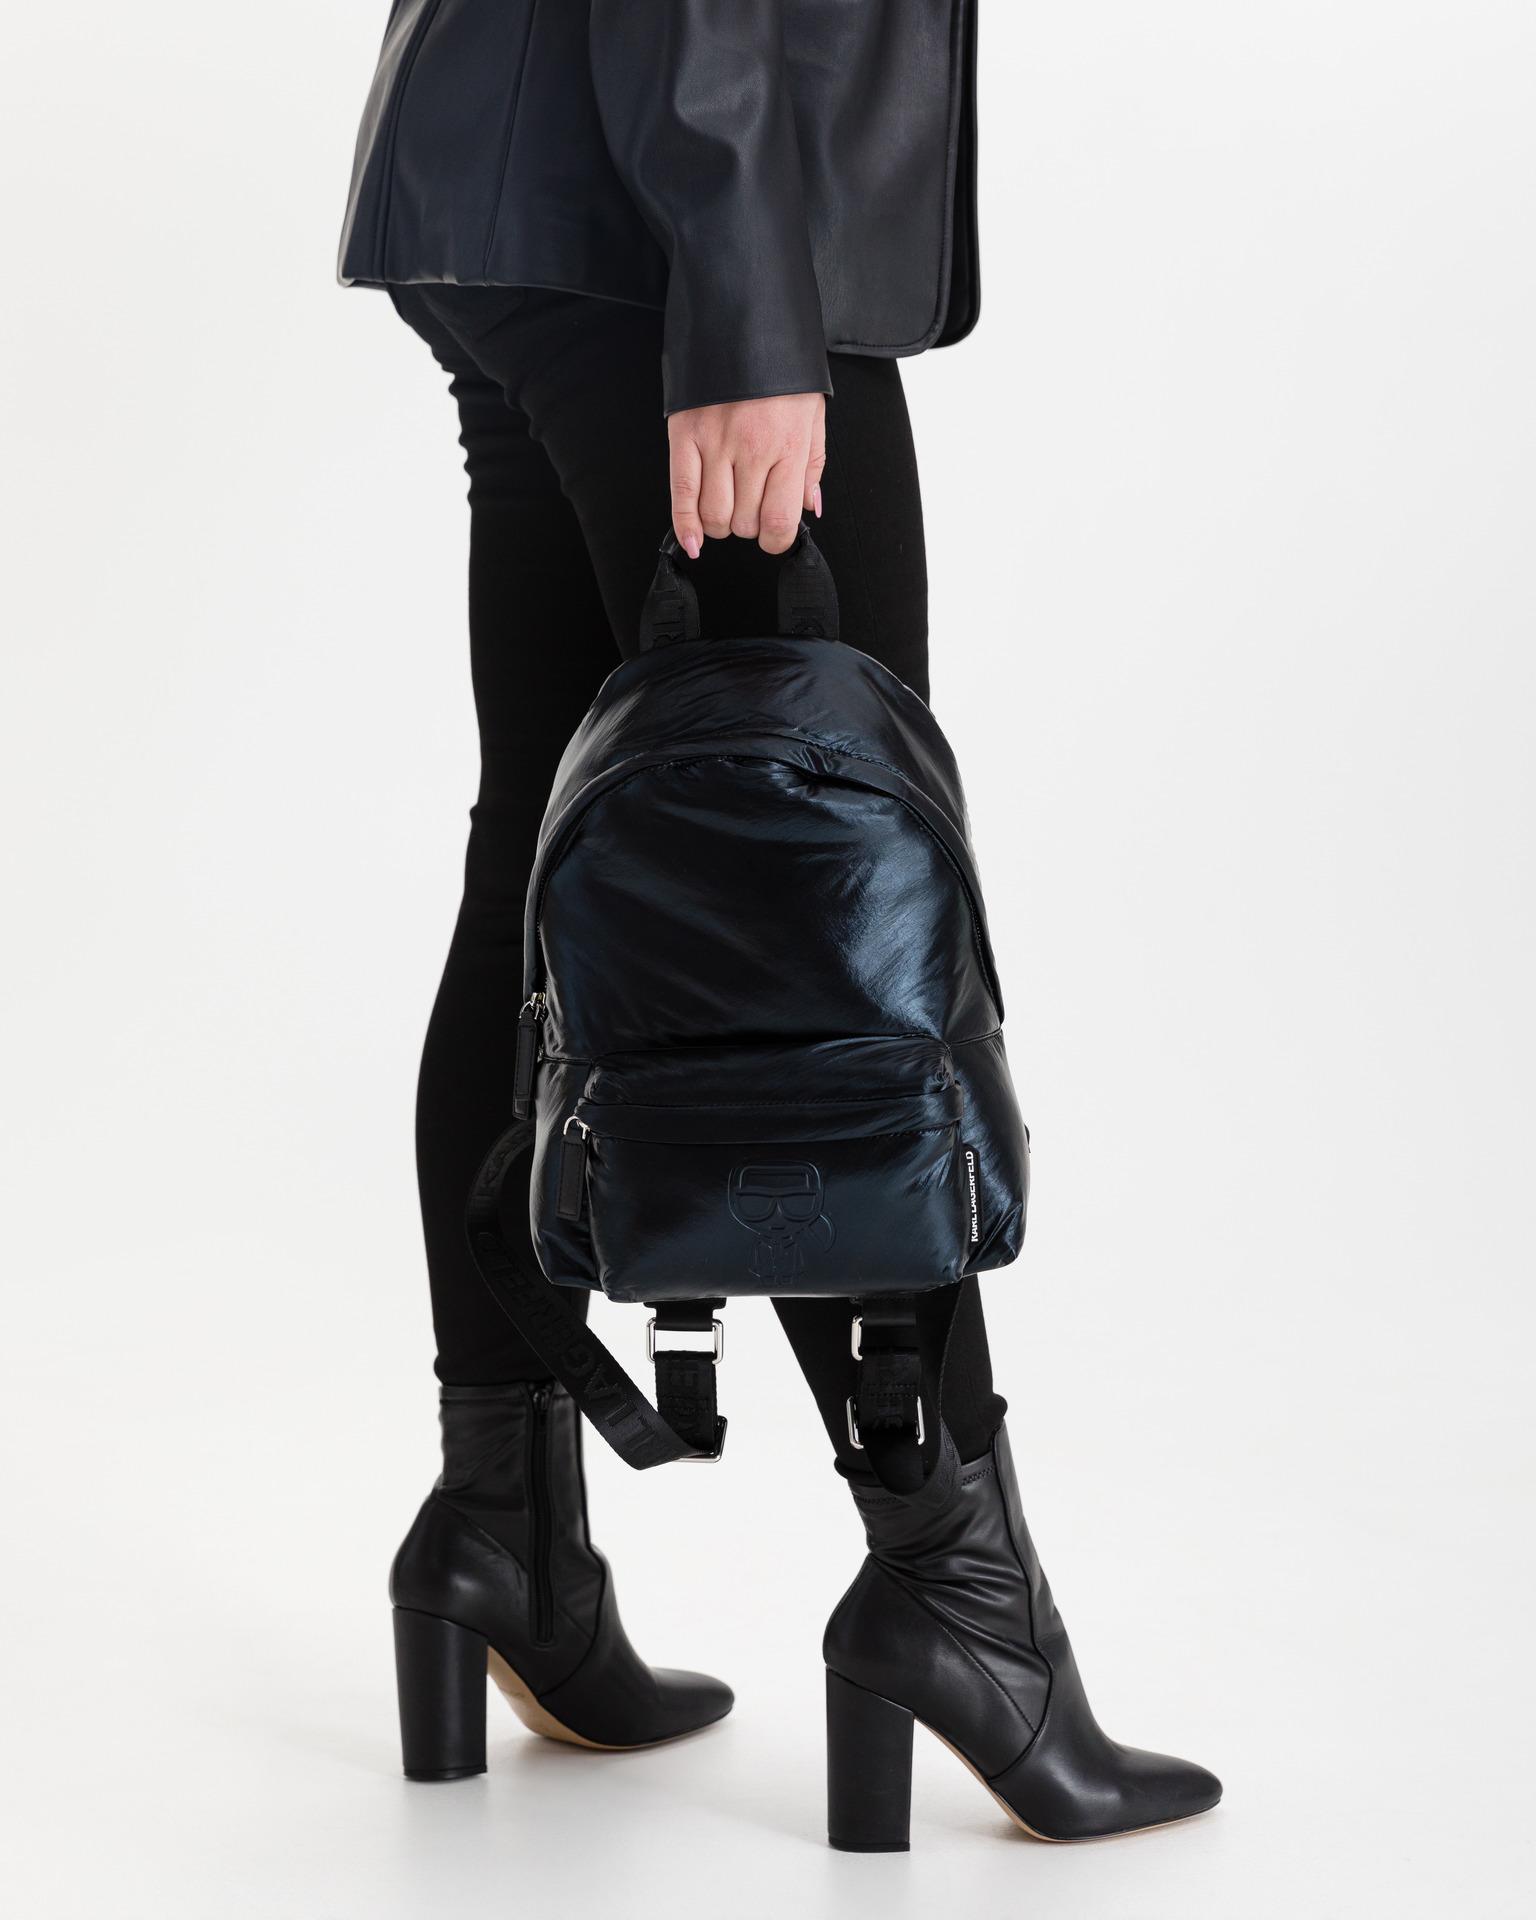 KARL LAGERFELD Plecak damski czarny Batoh